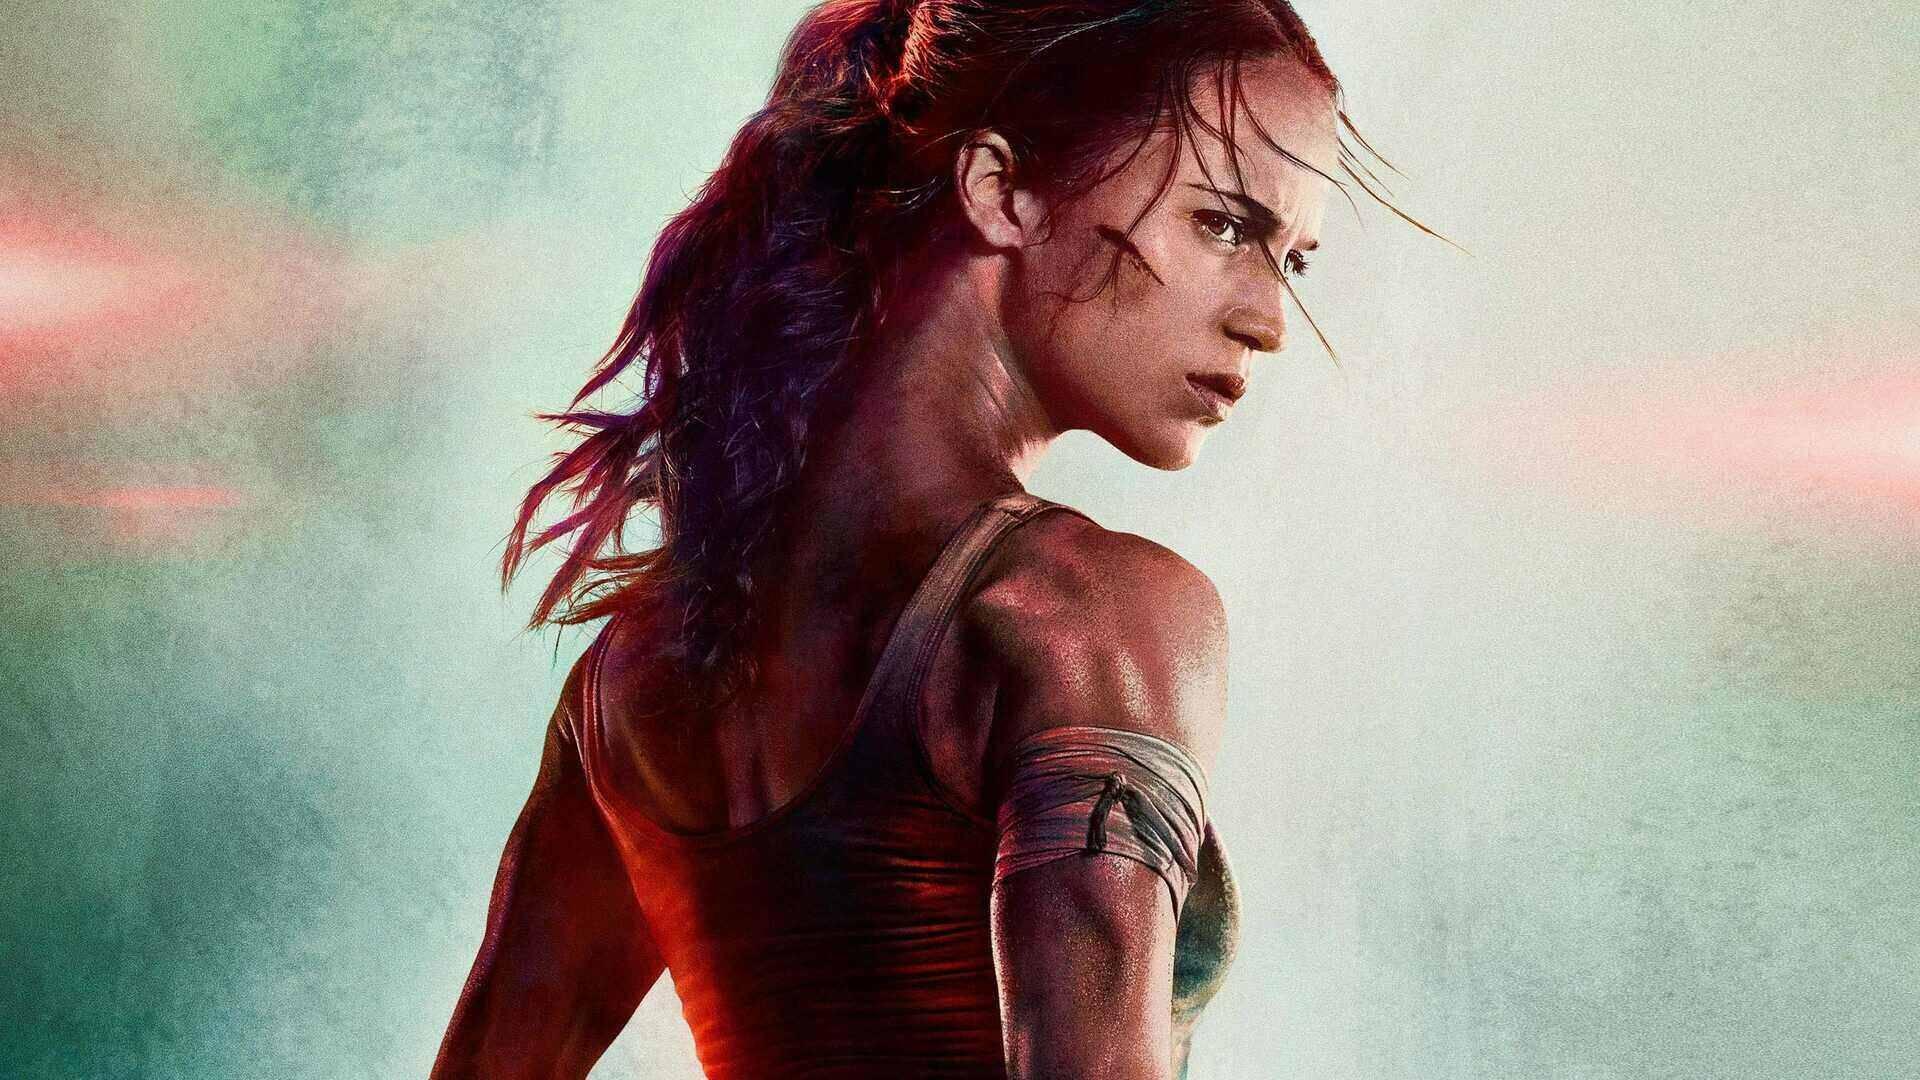 Tomb Raider Film